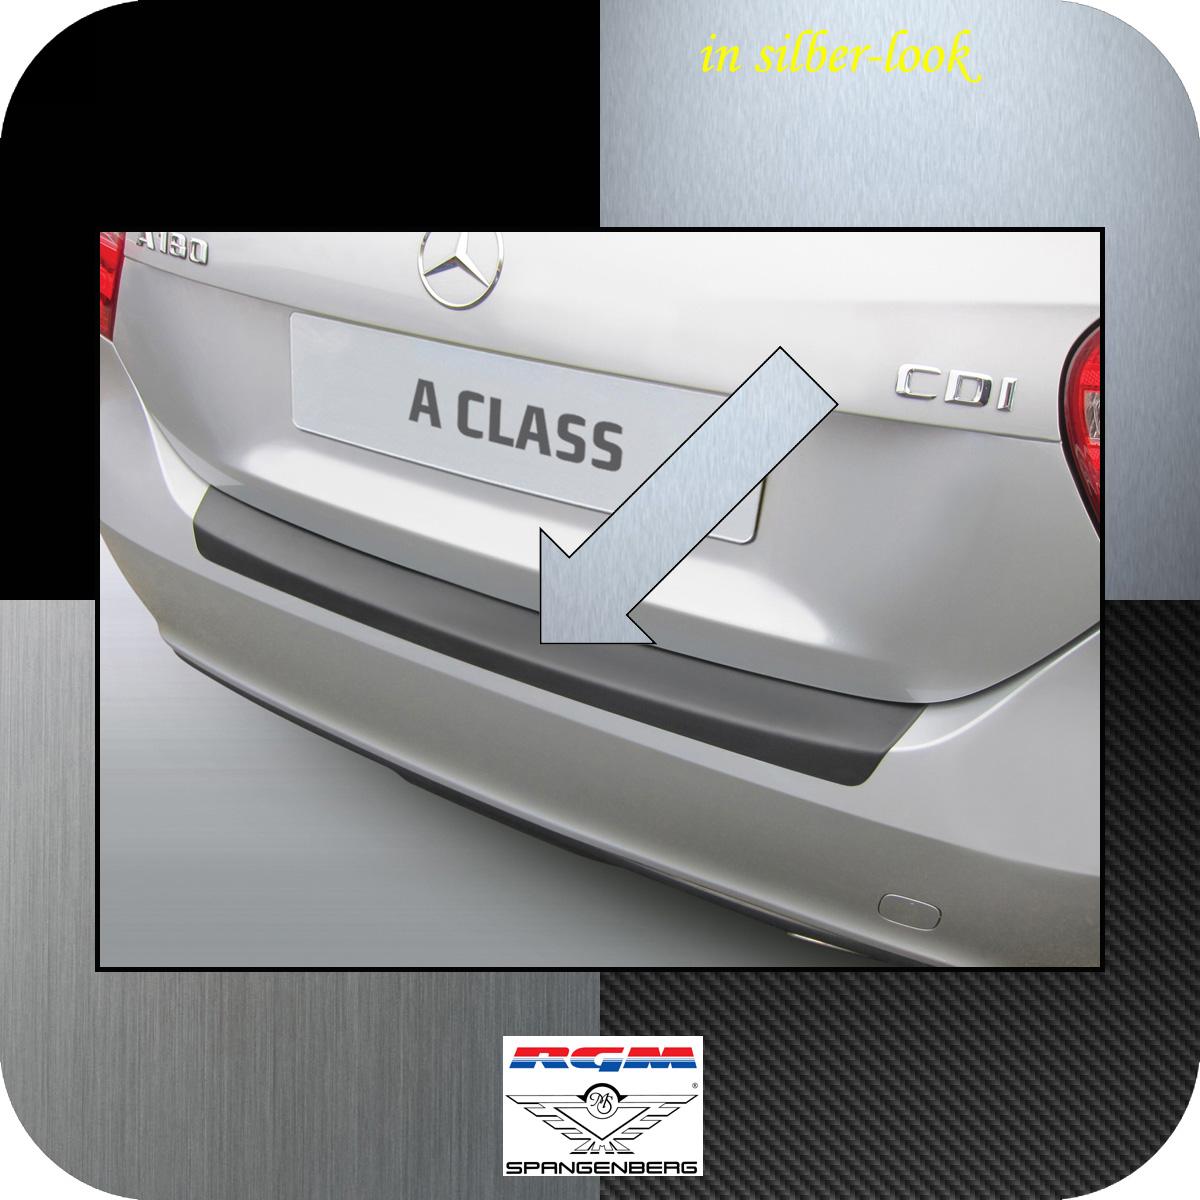 Ladekantenschutz Silber-Look Mercedes Benz A-Klasse W176 Schrägheck ´15- 3506933